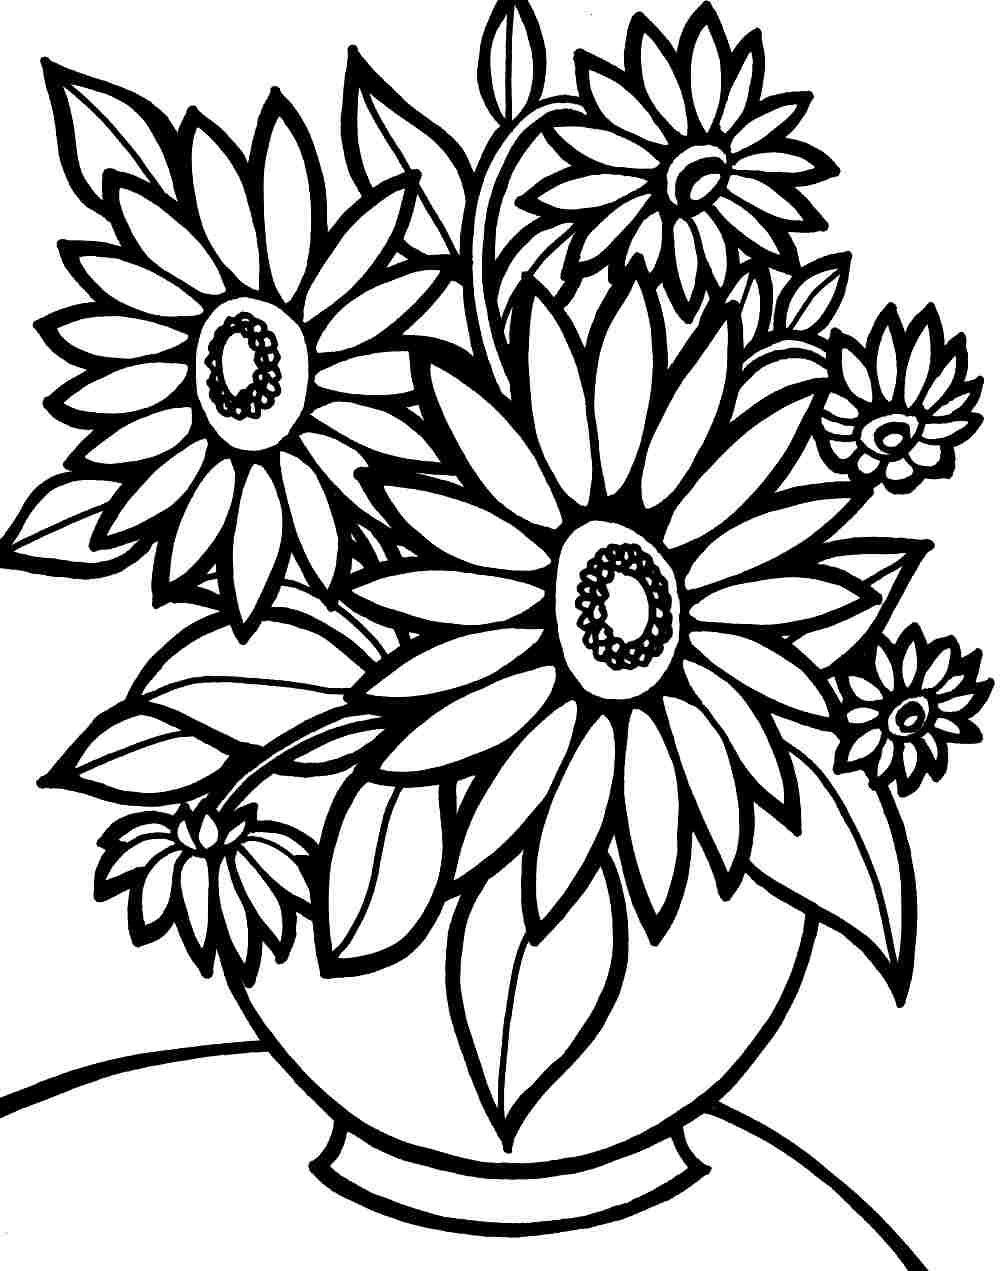 Pinhema On Drawing | Pinterest | Flower Coloring Pages - Free Printable Flower Coloring Pages